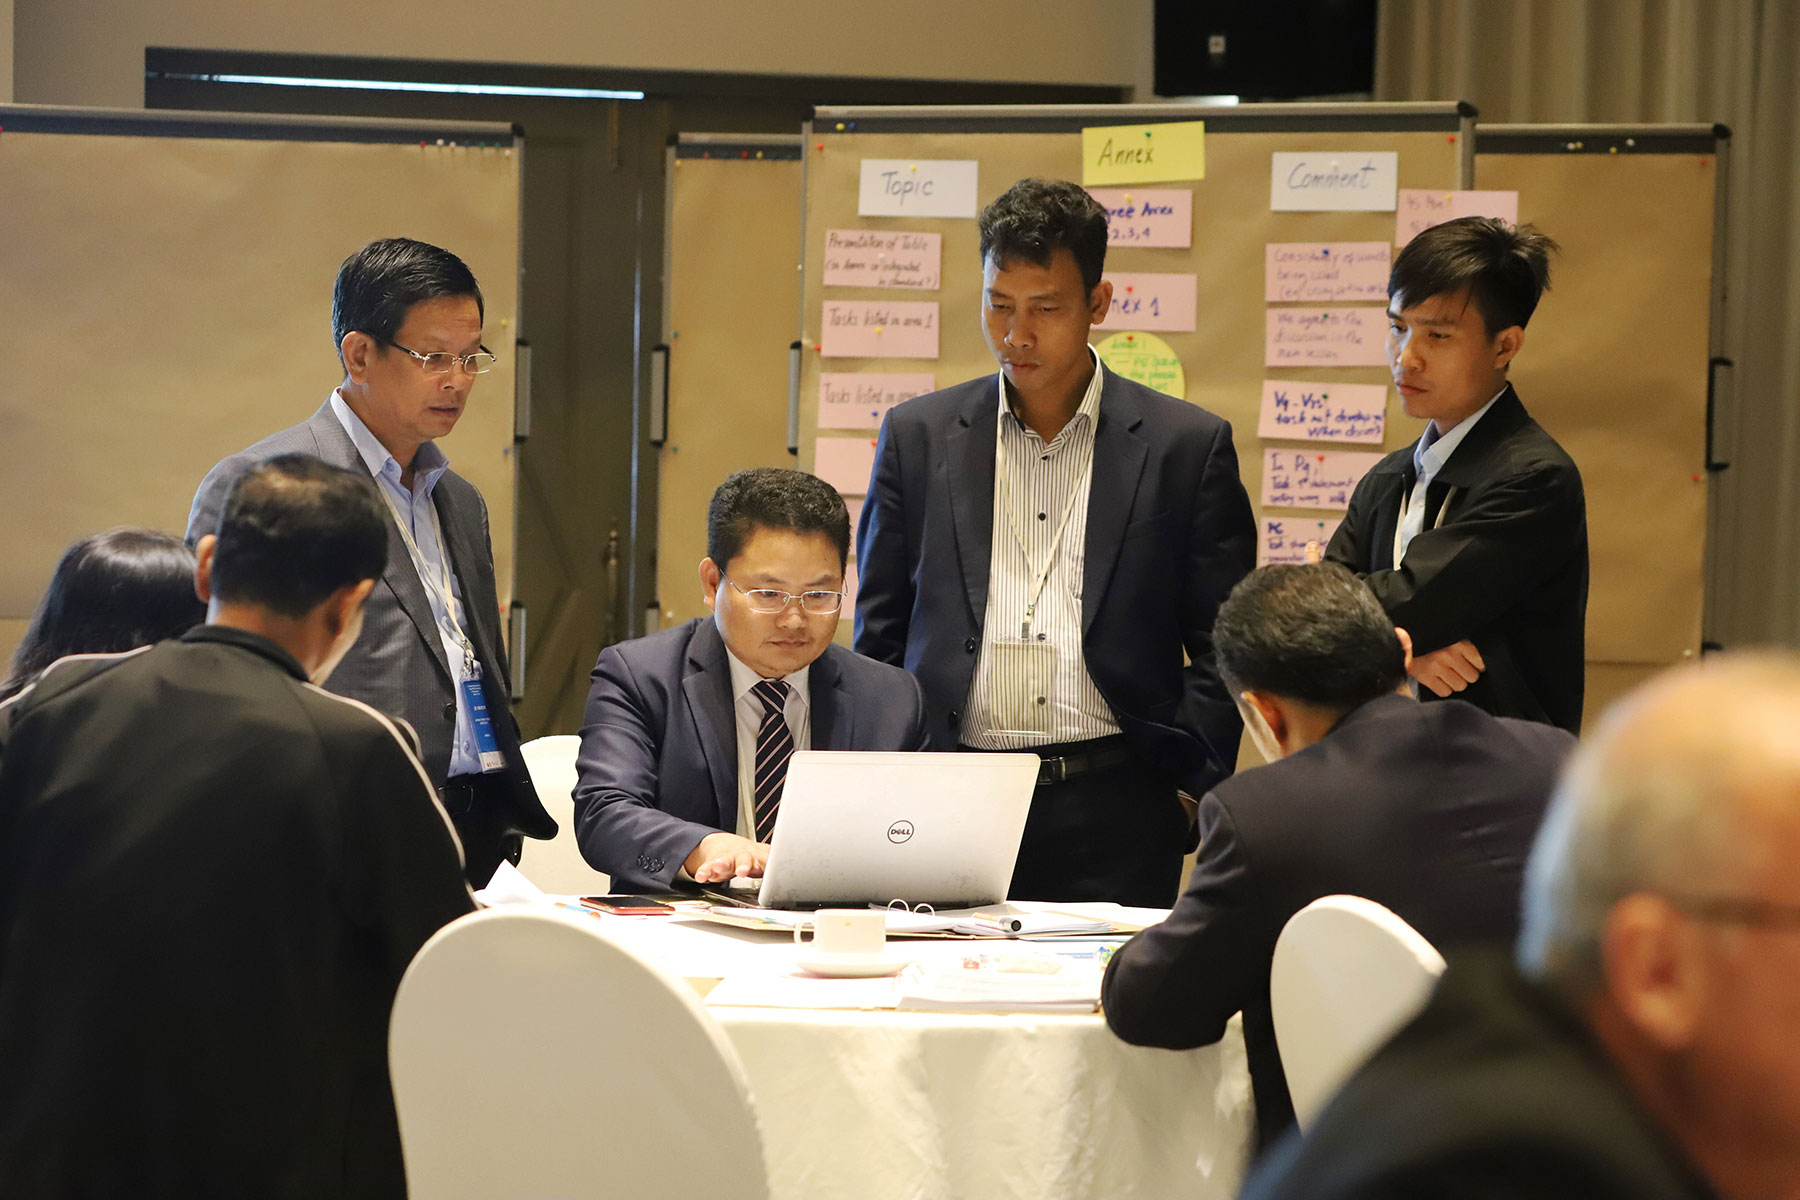 6 ASEAN countries meet to intensify green skills and vocational disciplines in Regional TVET Teacher Standard